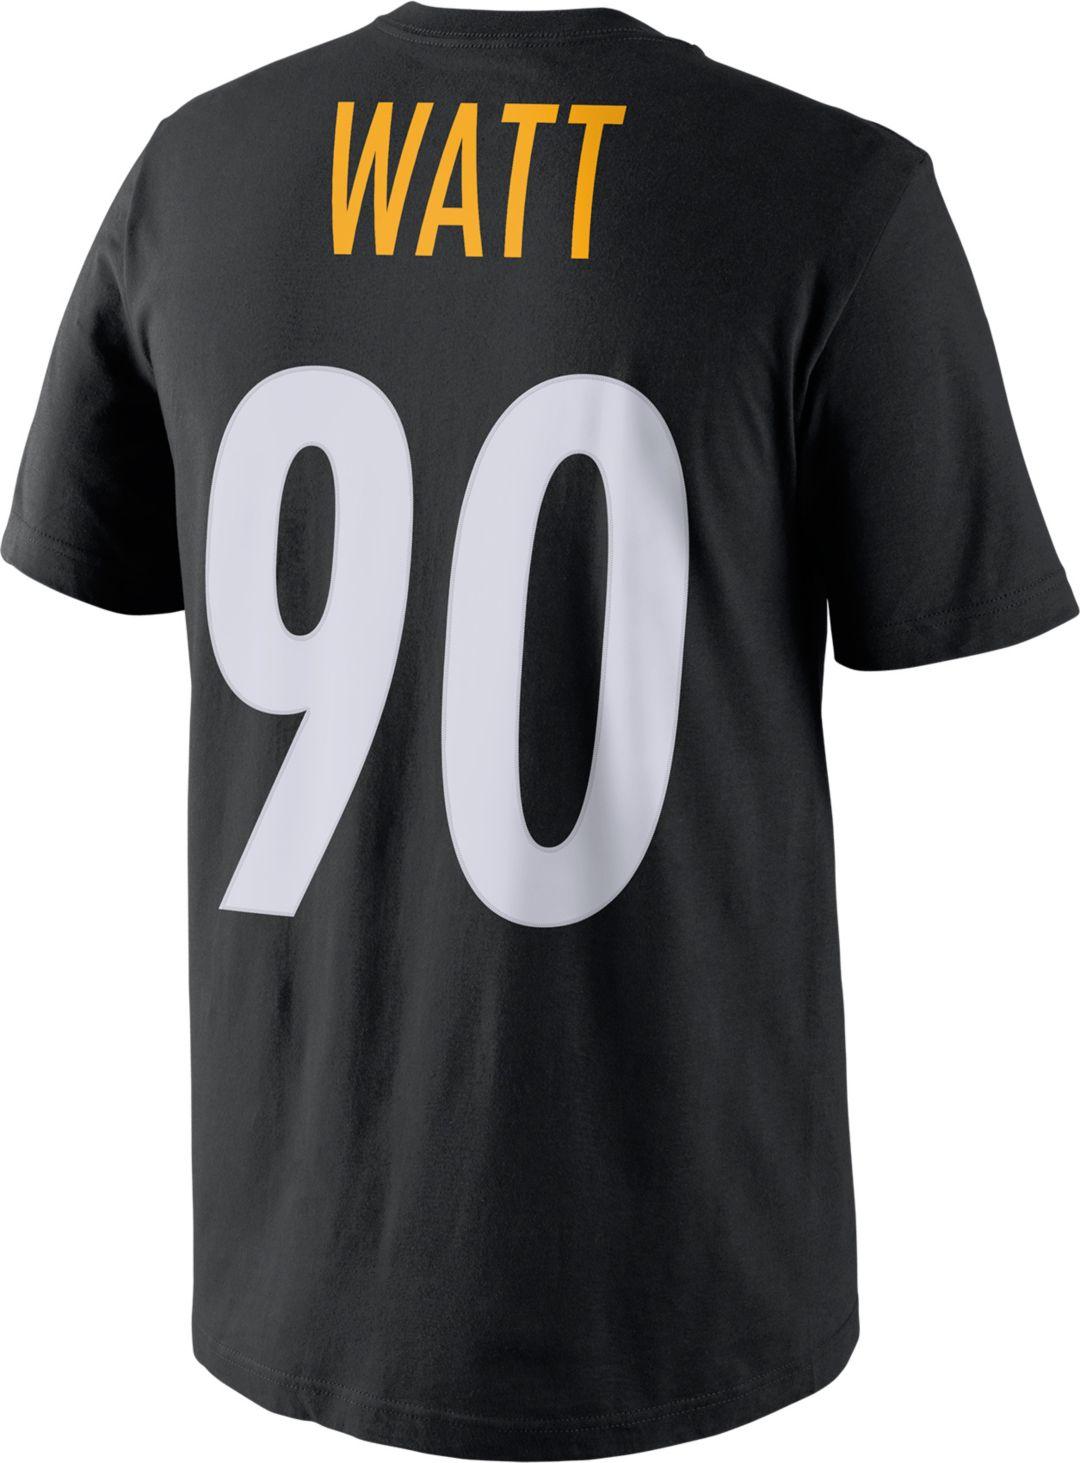 b72957c3b Nike Men's Pittsburgh Steelers T.J. Watt #90 Pride Black T-Shirt ...